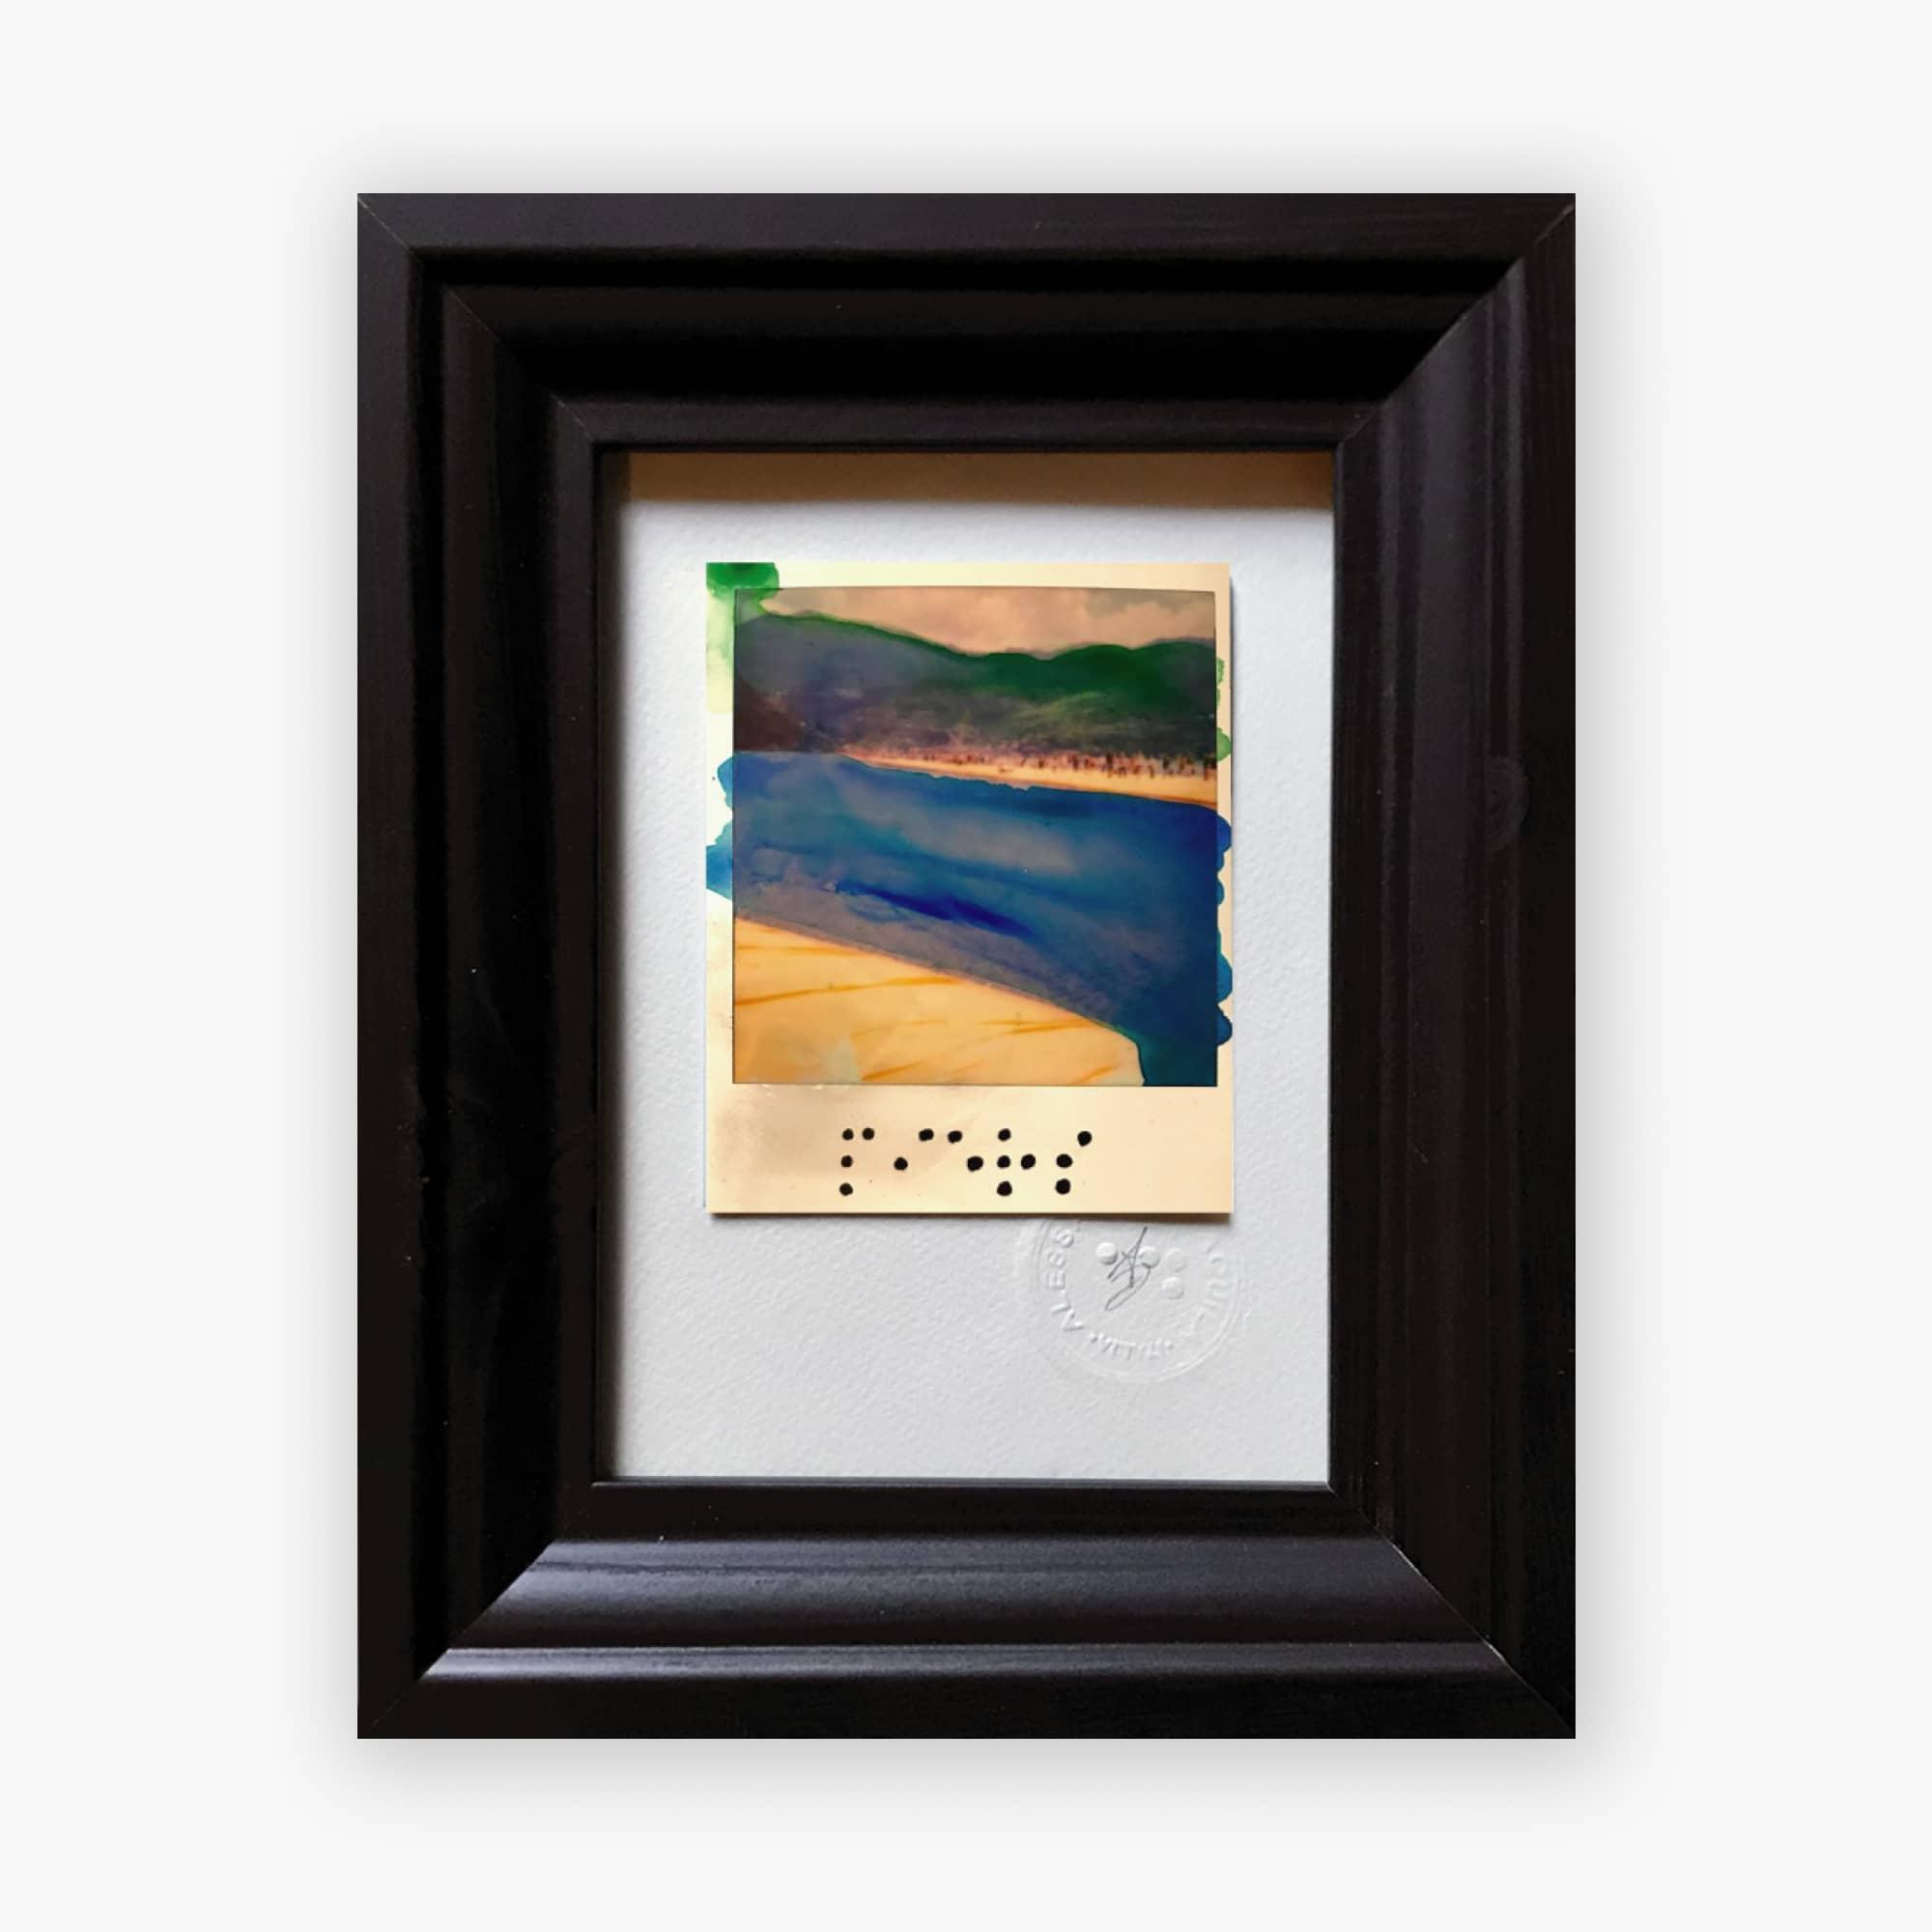 The Floating Polaroid #6